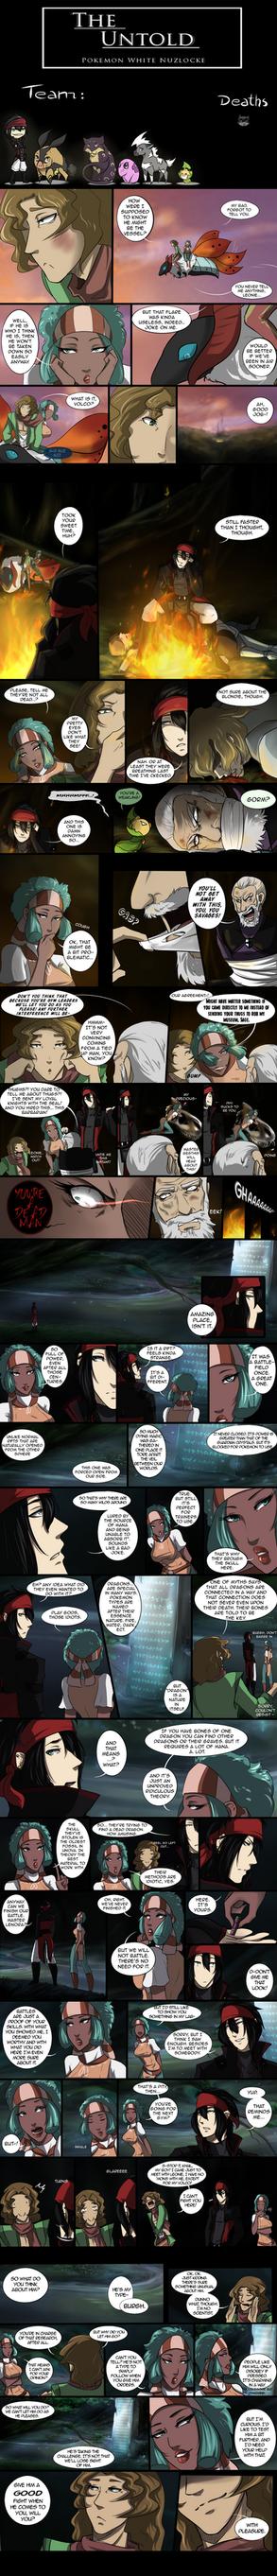 The Untold - part 38 by Antarija